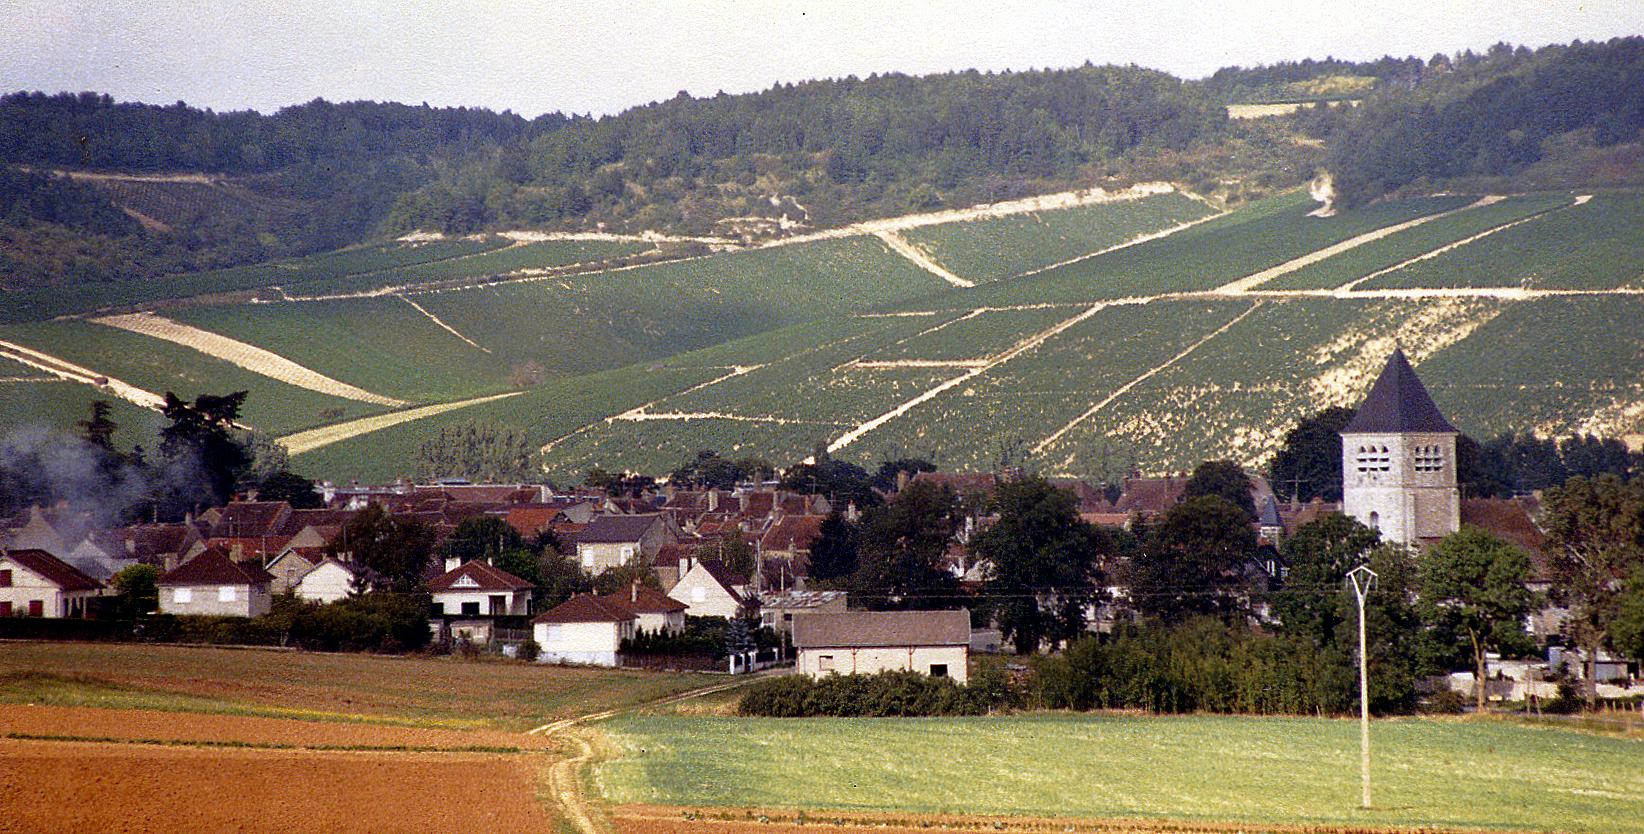 Vineyards in champagne region france for Champagne region in france